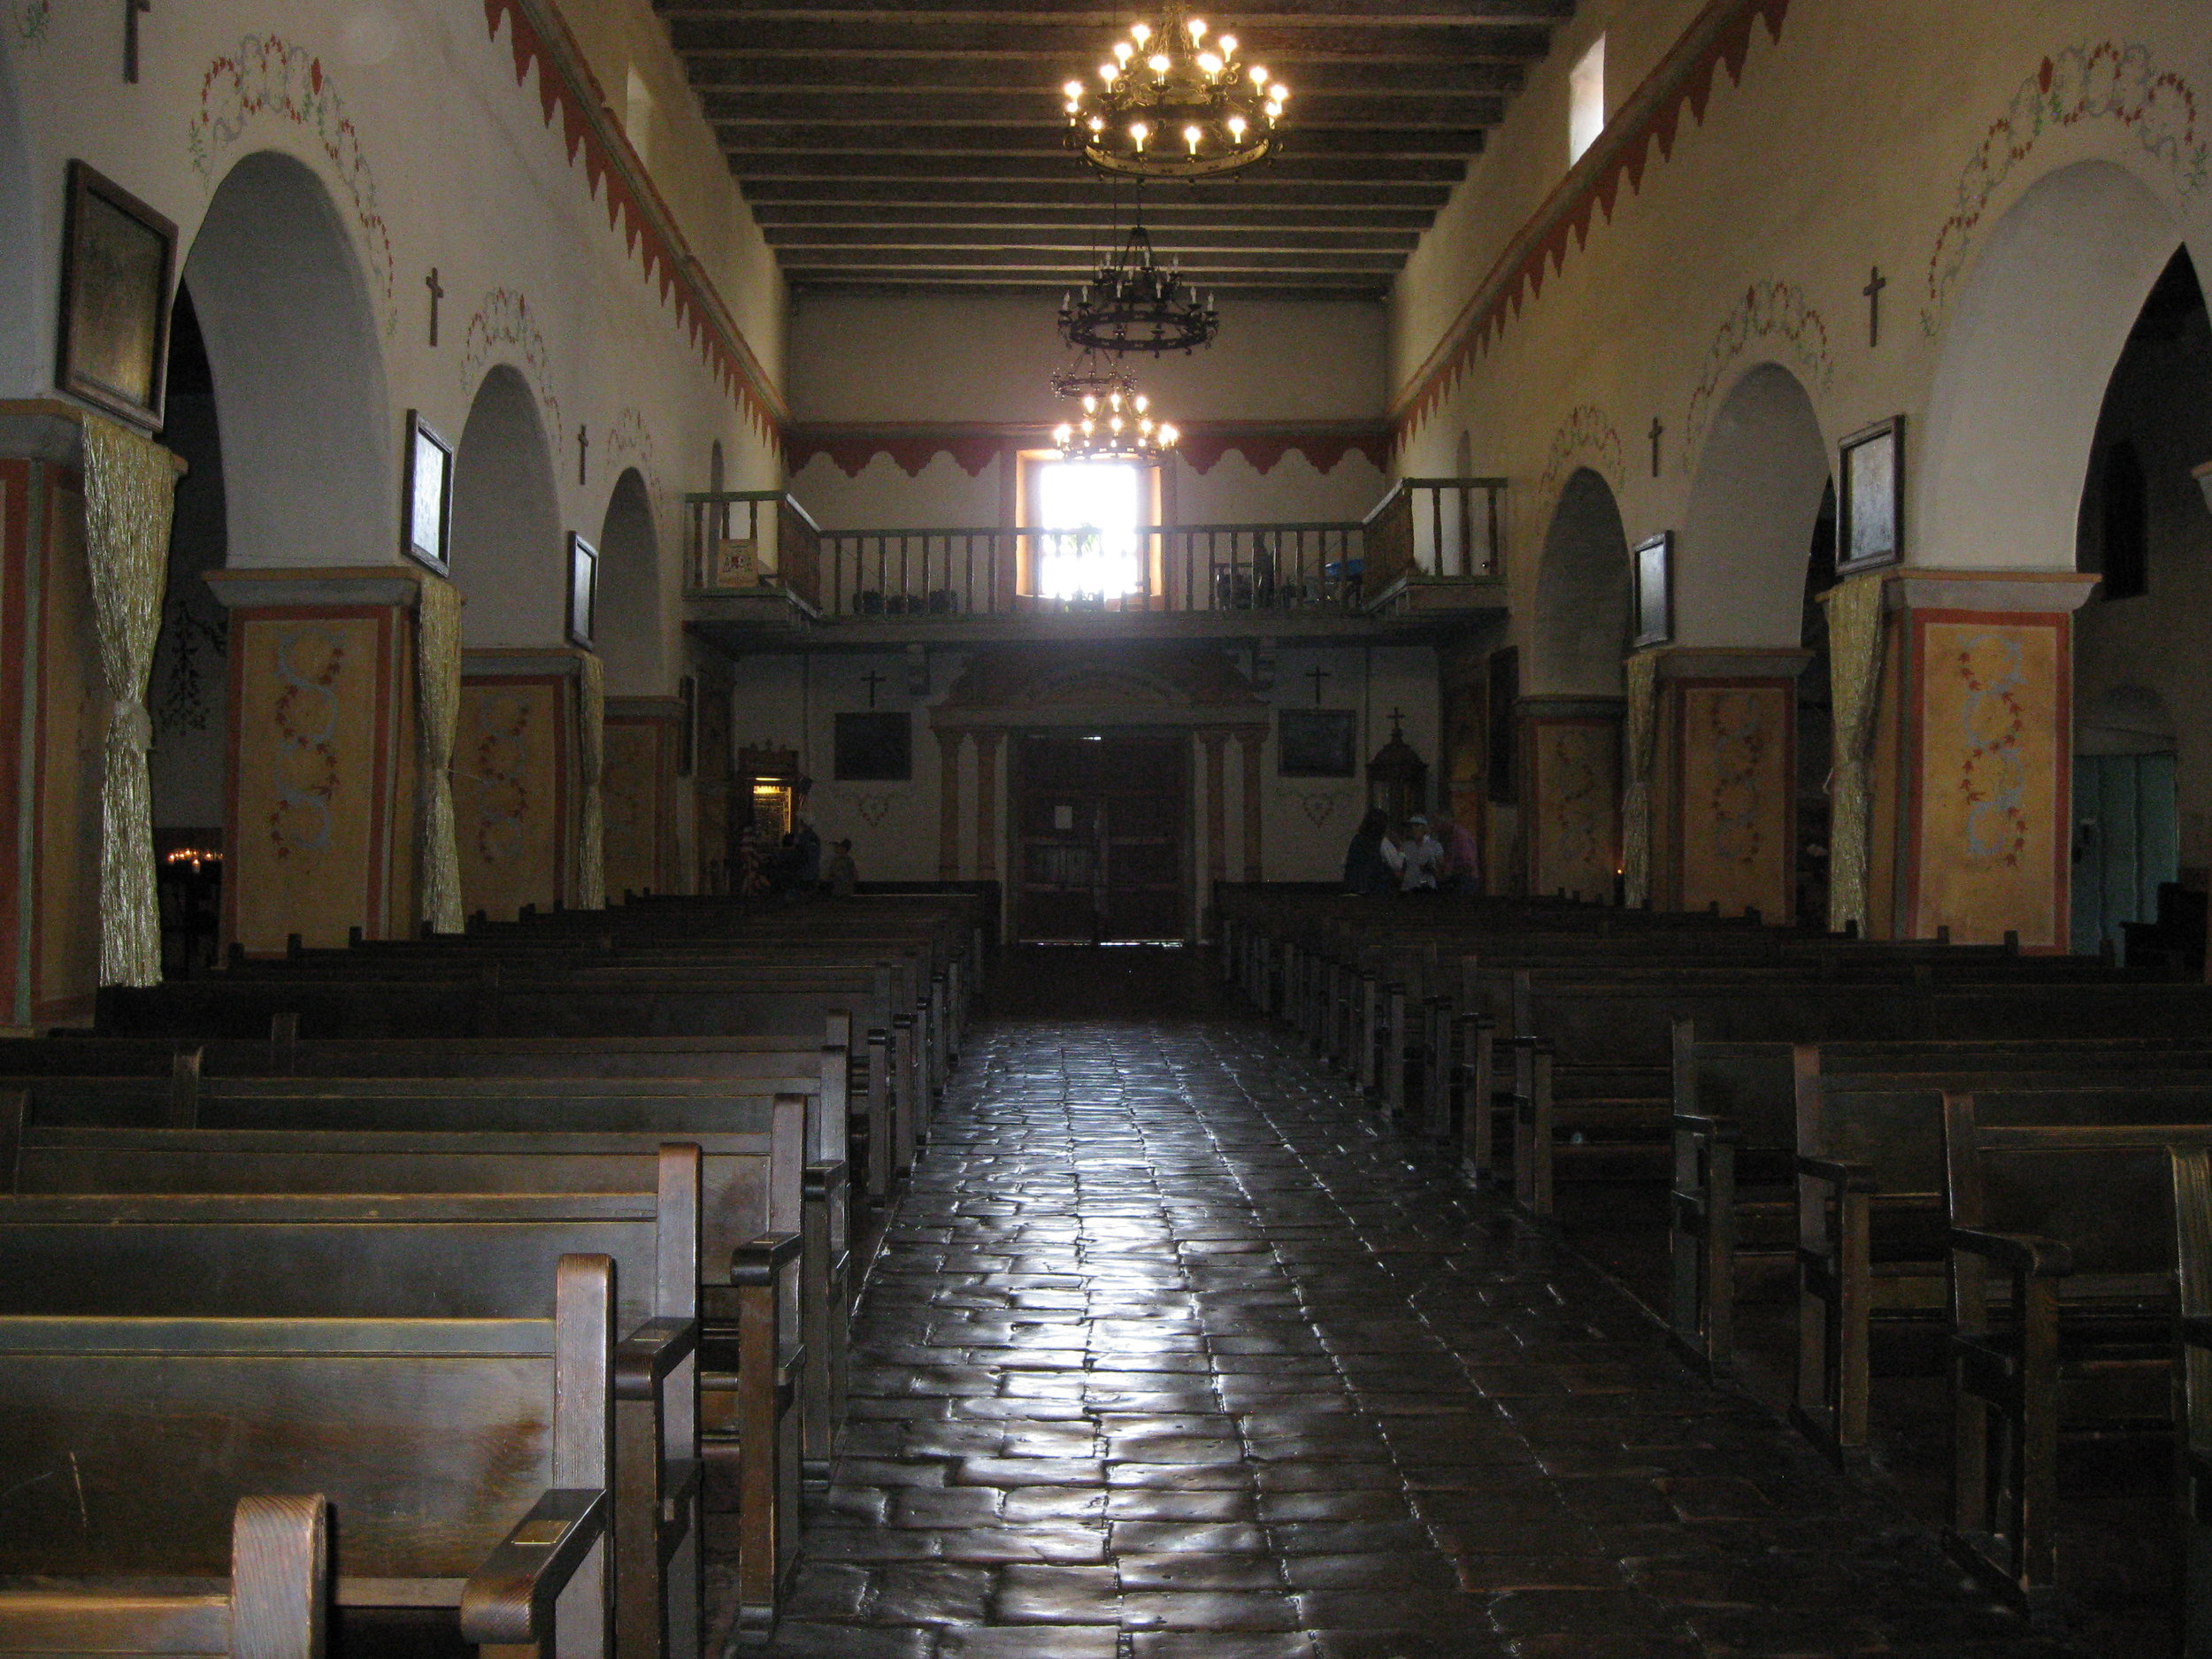 The Church at San Juan Bautista. Photo by Steve Newvine